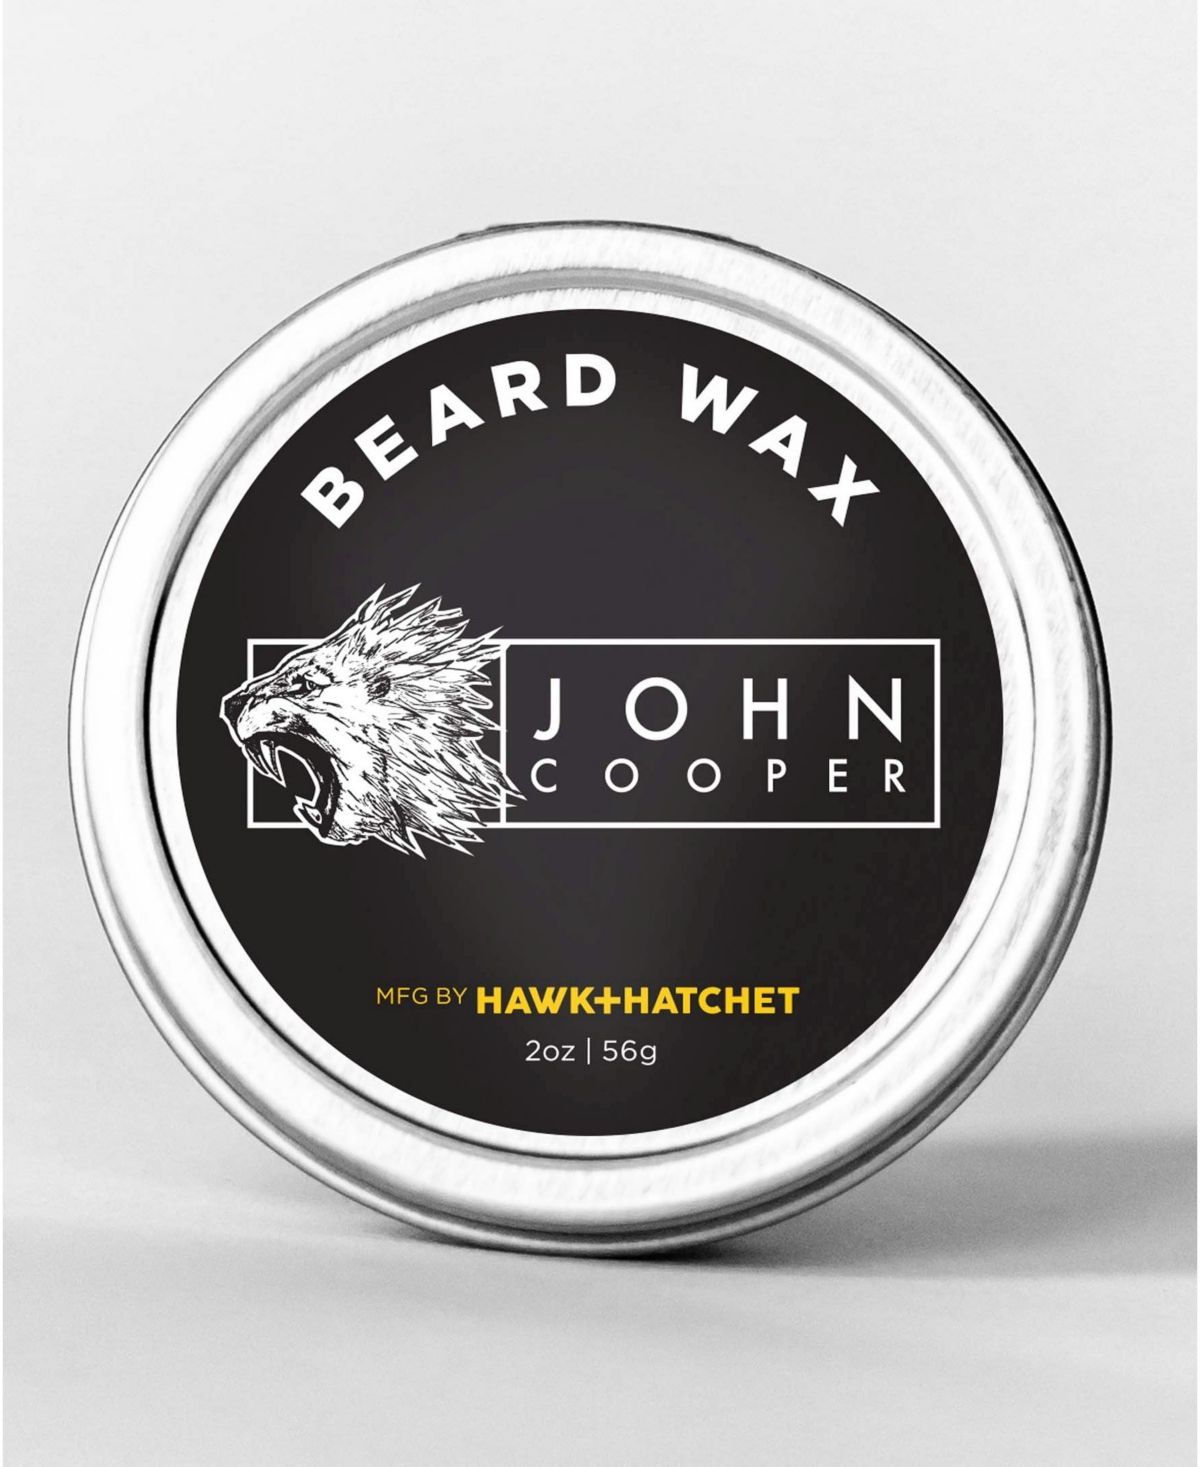 Hawk and Hatchet John Cooper Signature Beard Wax & Reviews - Makeup - Beauty - Macy's#beard #beauty #cooper #hatchet #hawk #john #macys #makeup #reviews #signature #wax